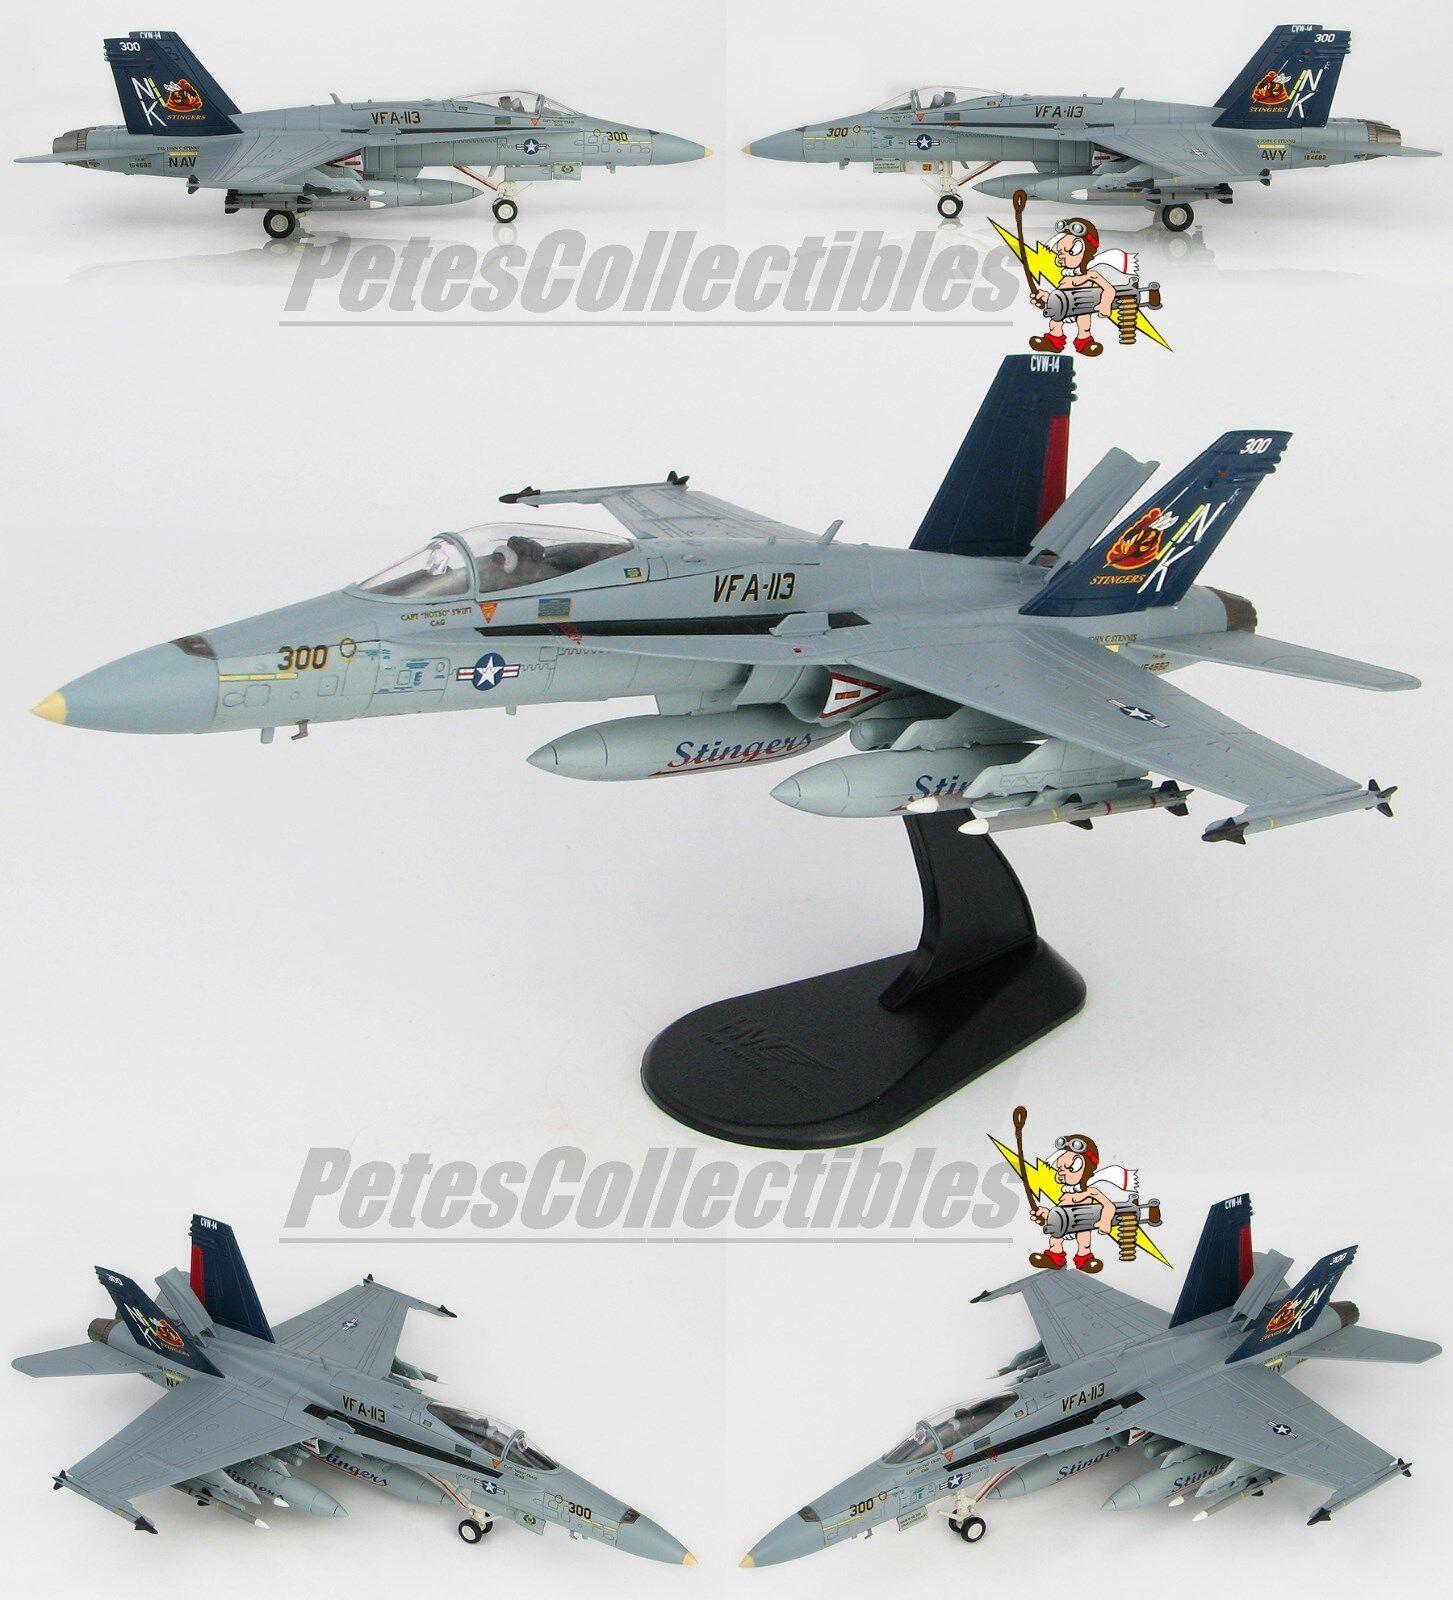 HOBBY MASTER HA3540 HA3540 HA3540 McDonnell Douglas F A-18C Hornet VFA-113 Stingers BuNo164682 233856